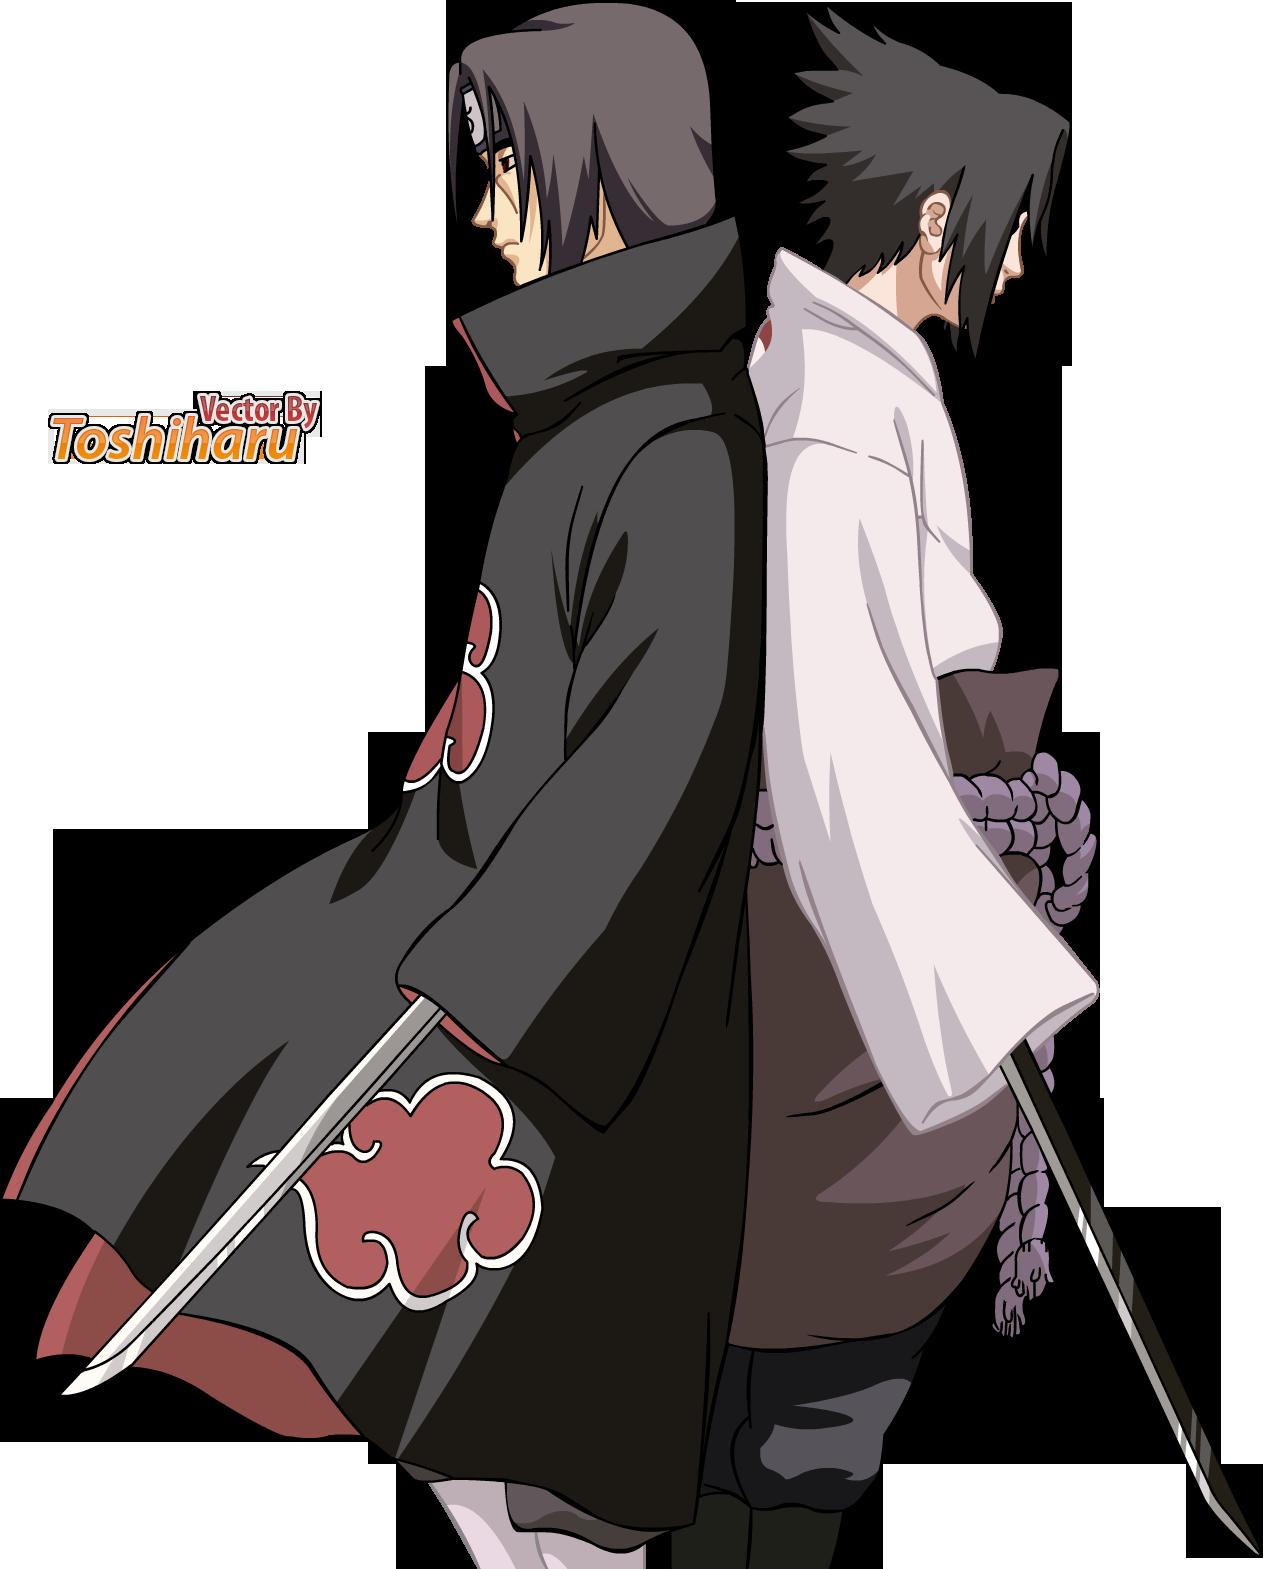 137 1374718 transparent itachi anime wallpaper naruto shippuden itachi y